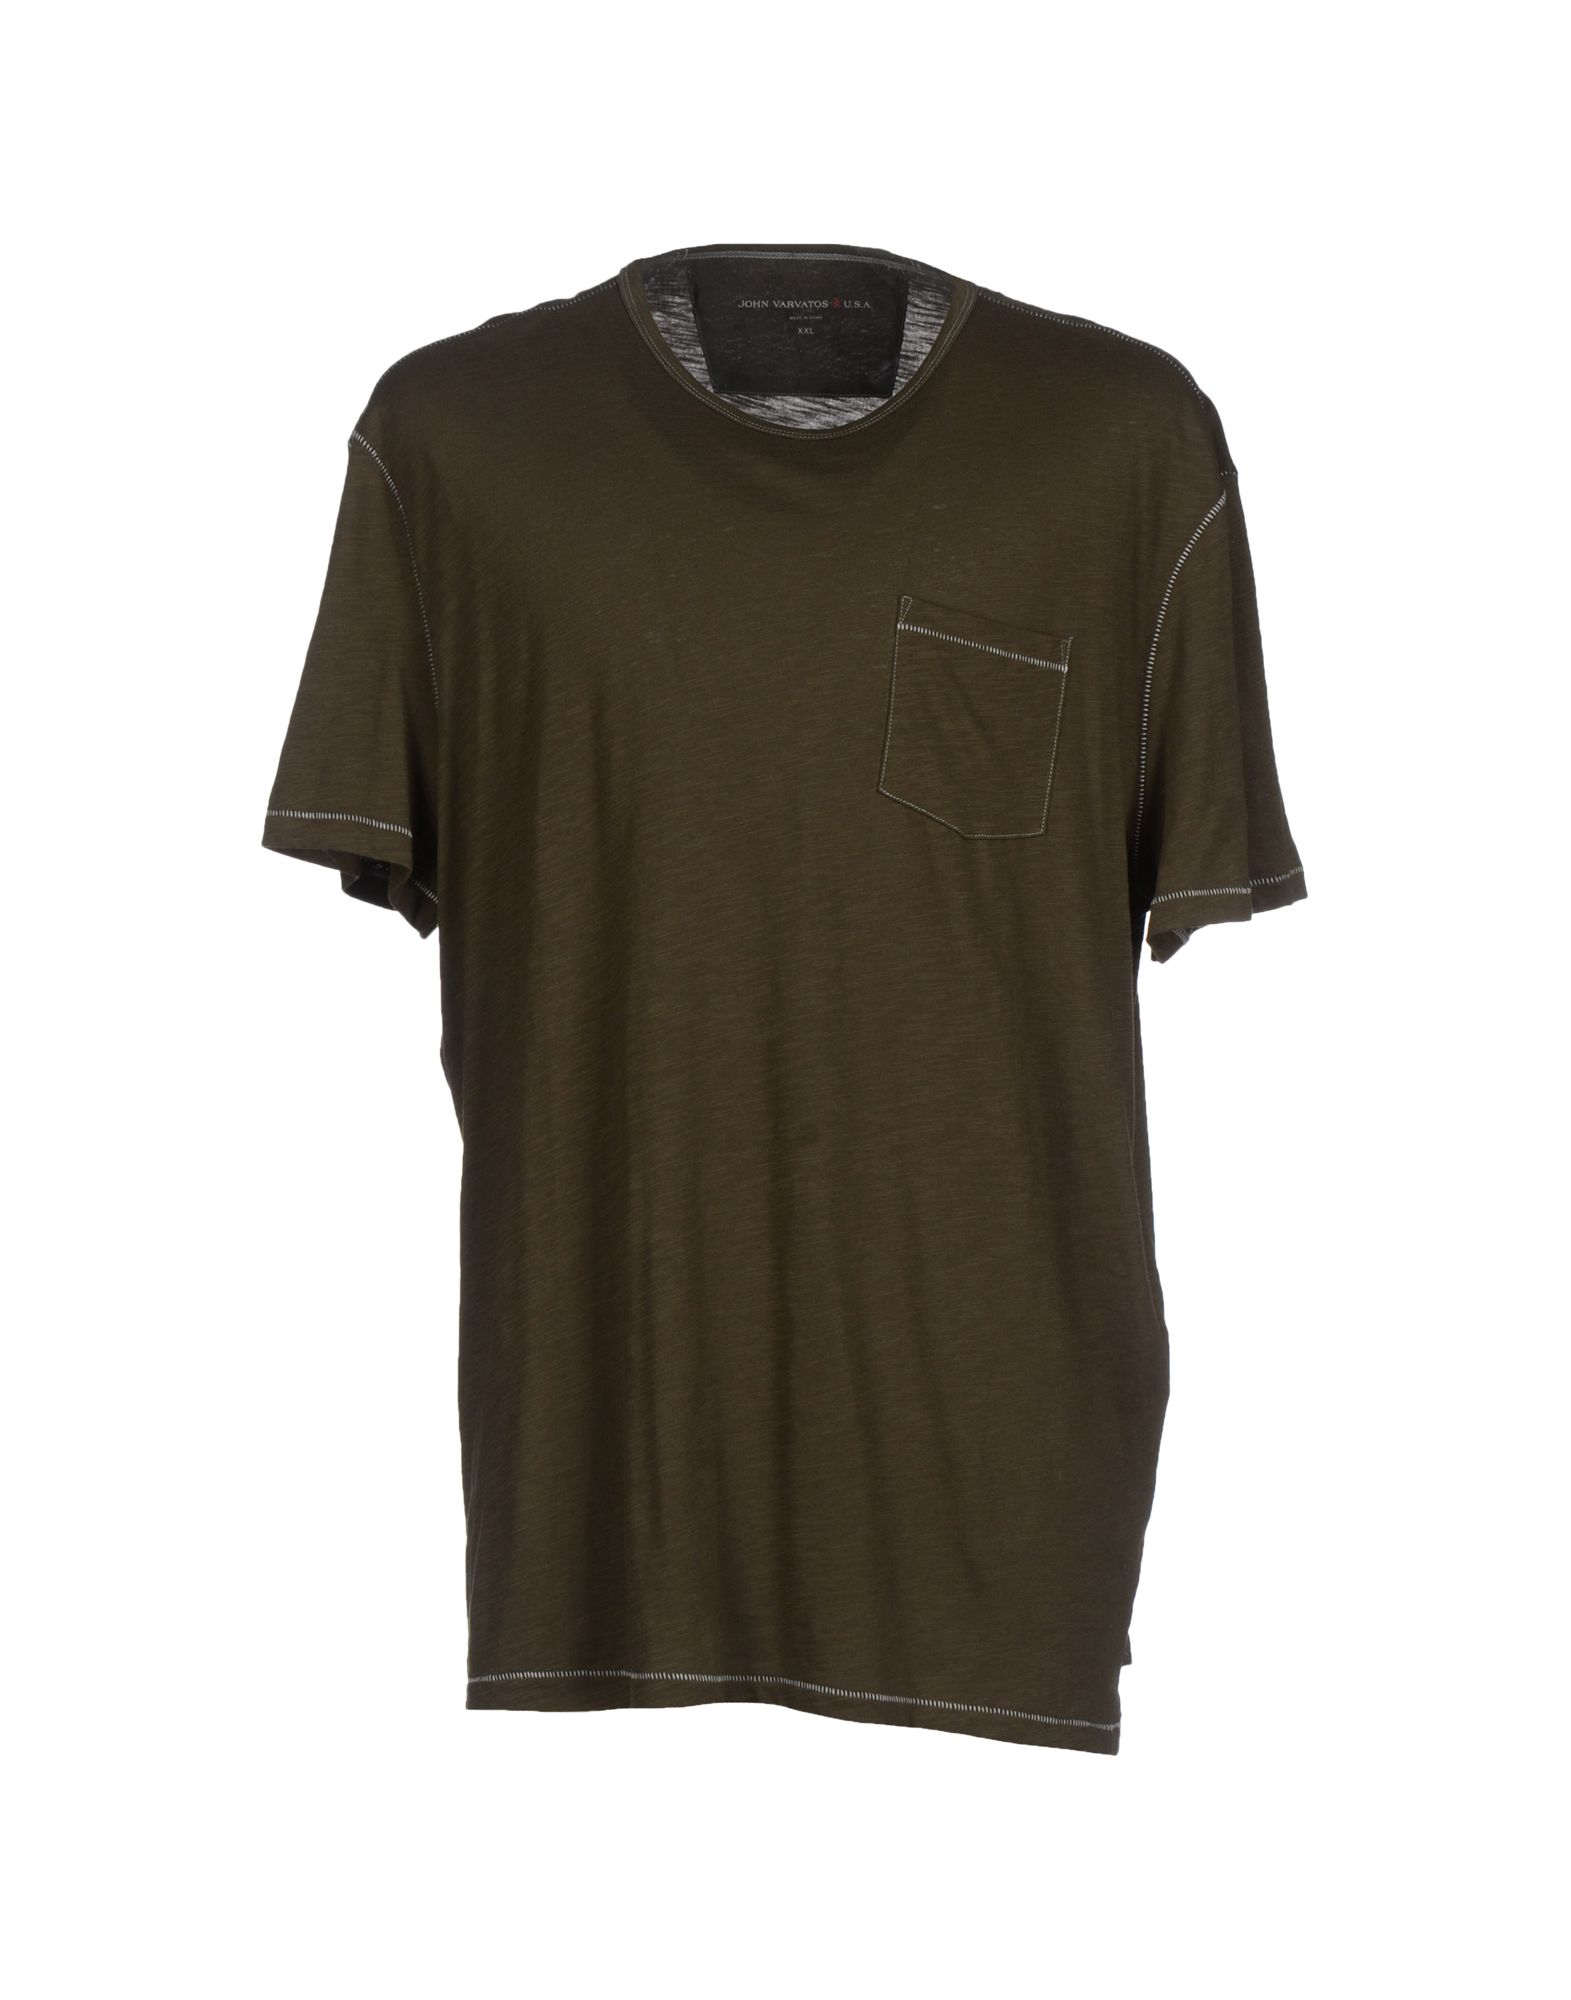 john varvatos t shirt in green for men military green lyst